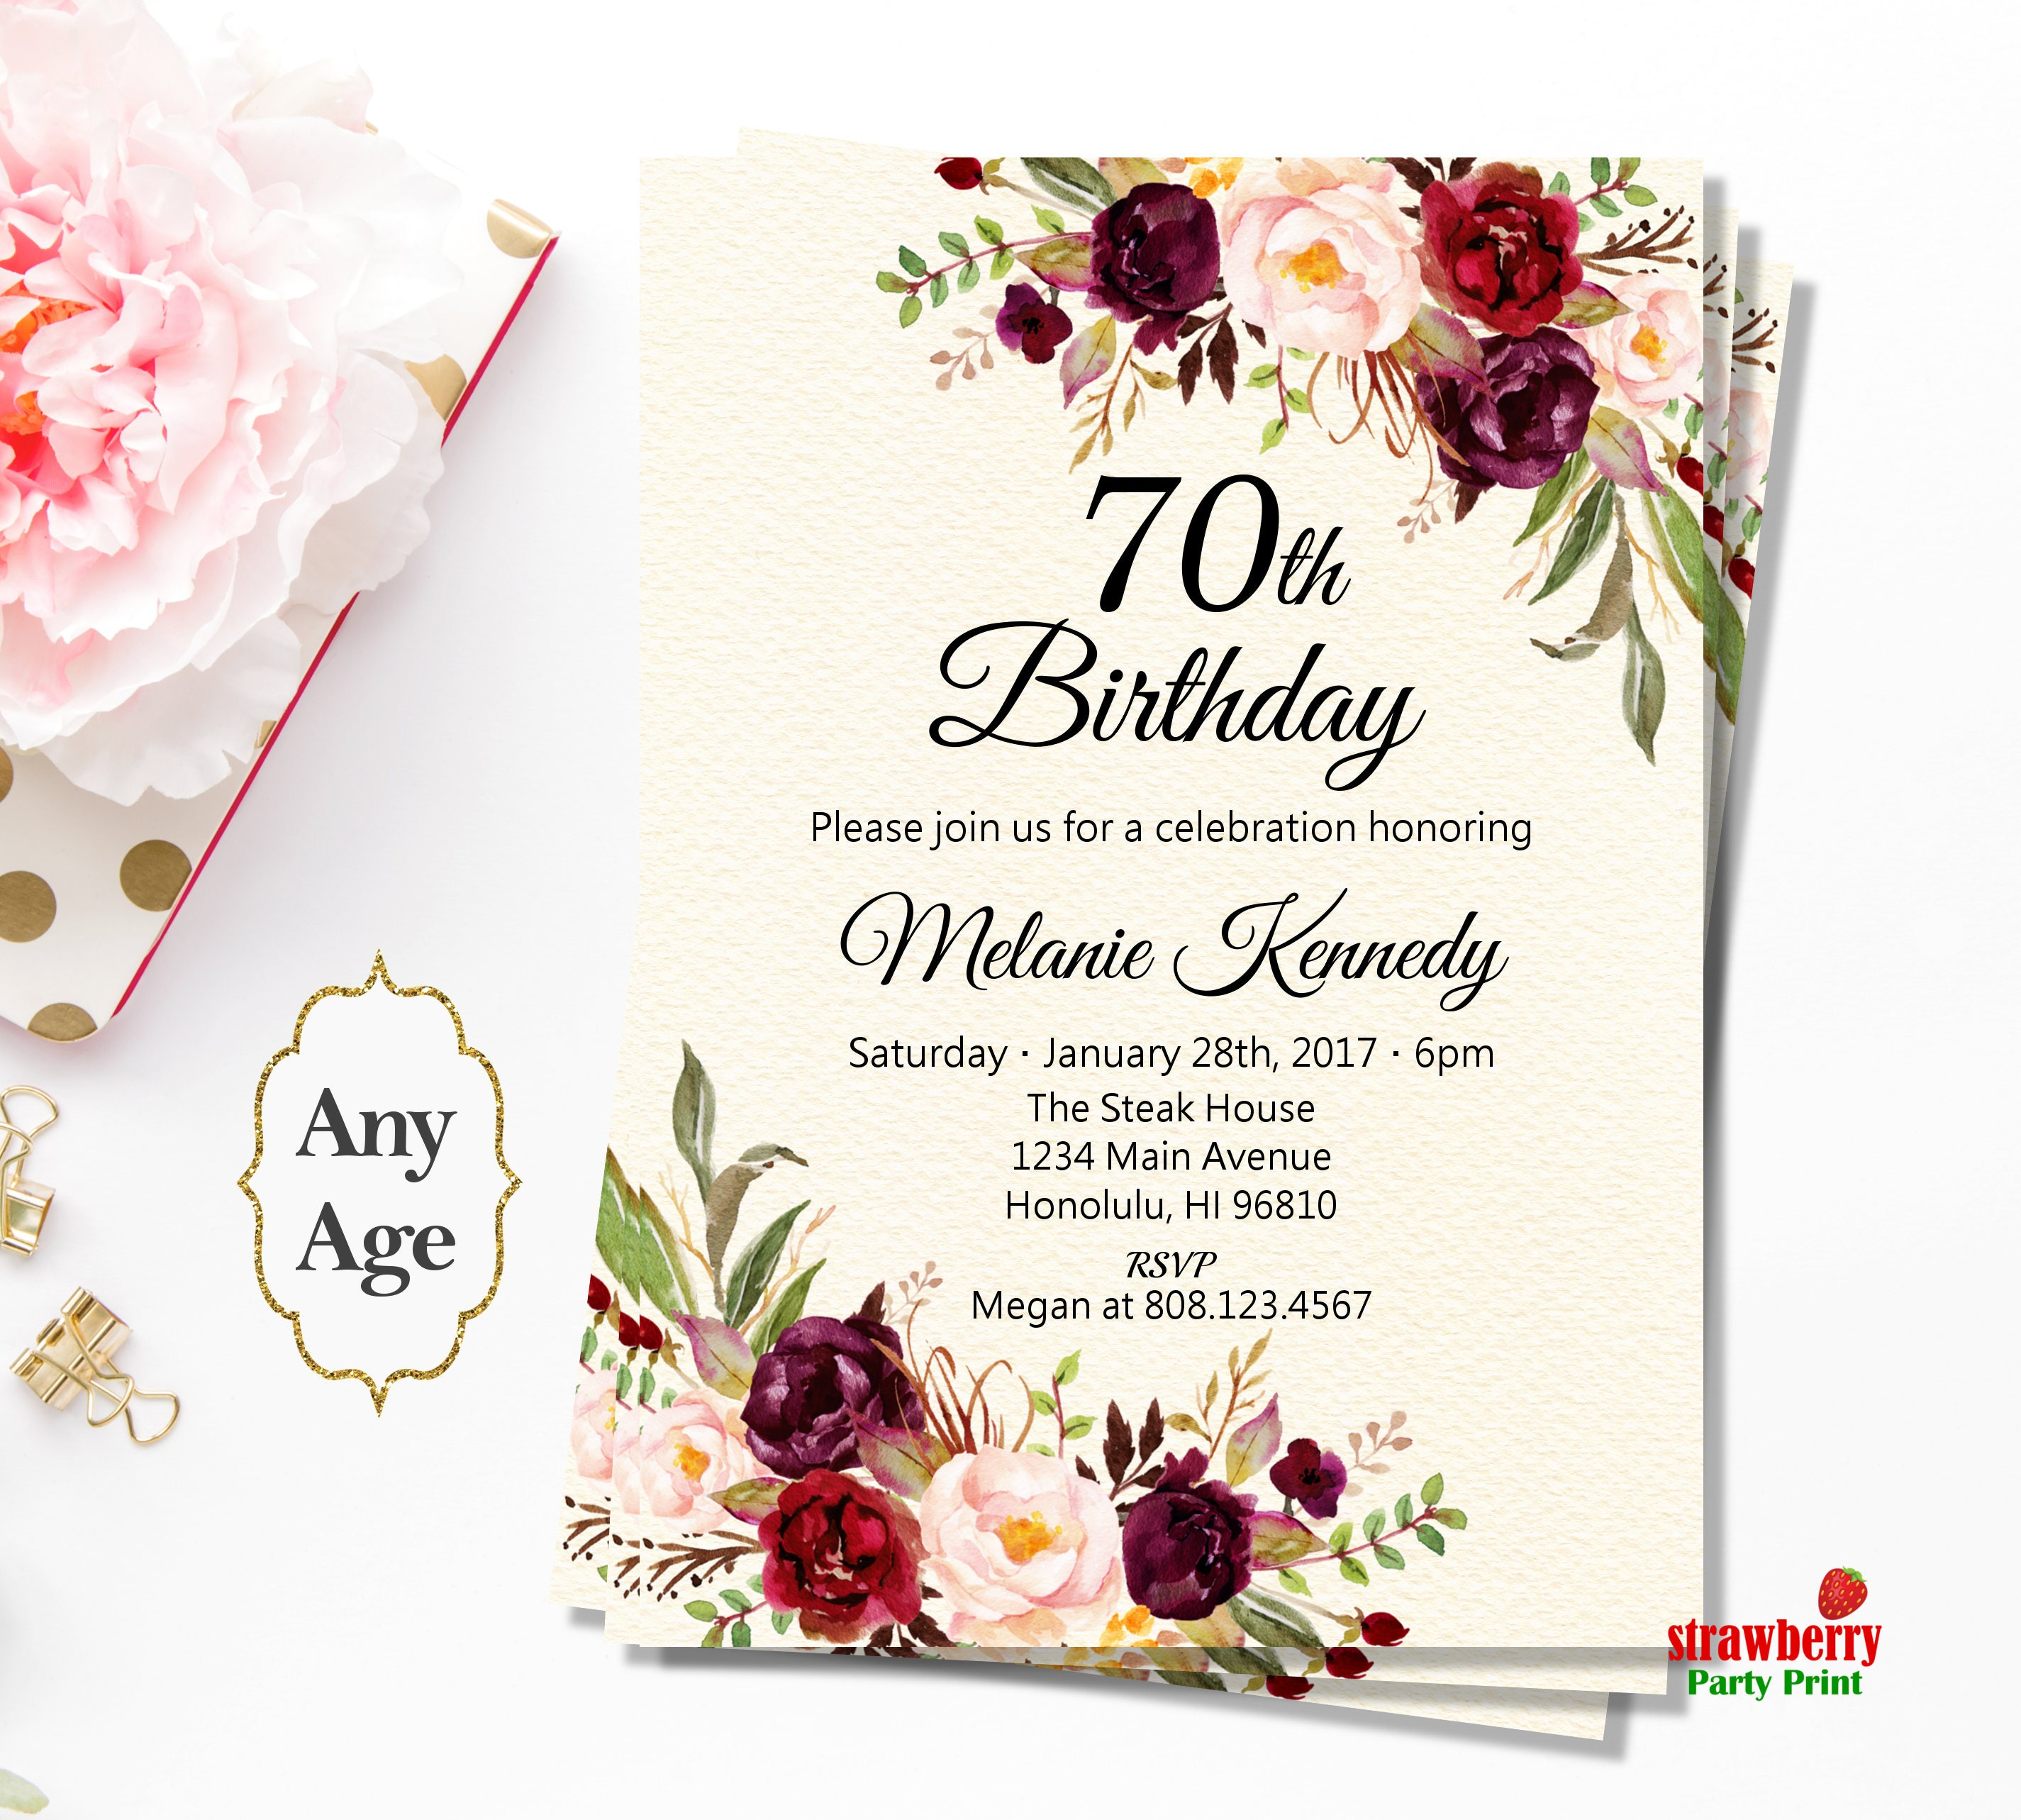 70th Birthday Invitation For Women. Floral Birthday Invitation. Boho ...